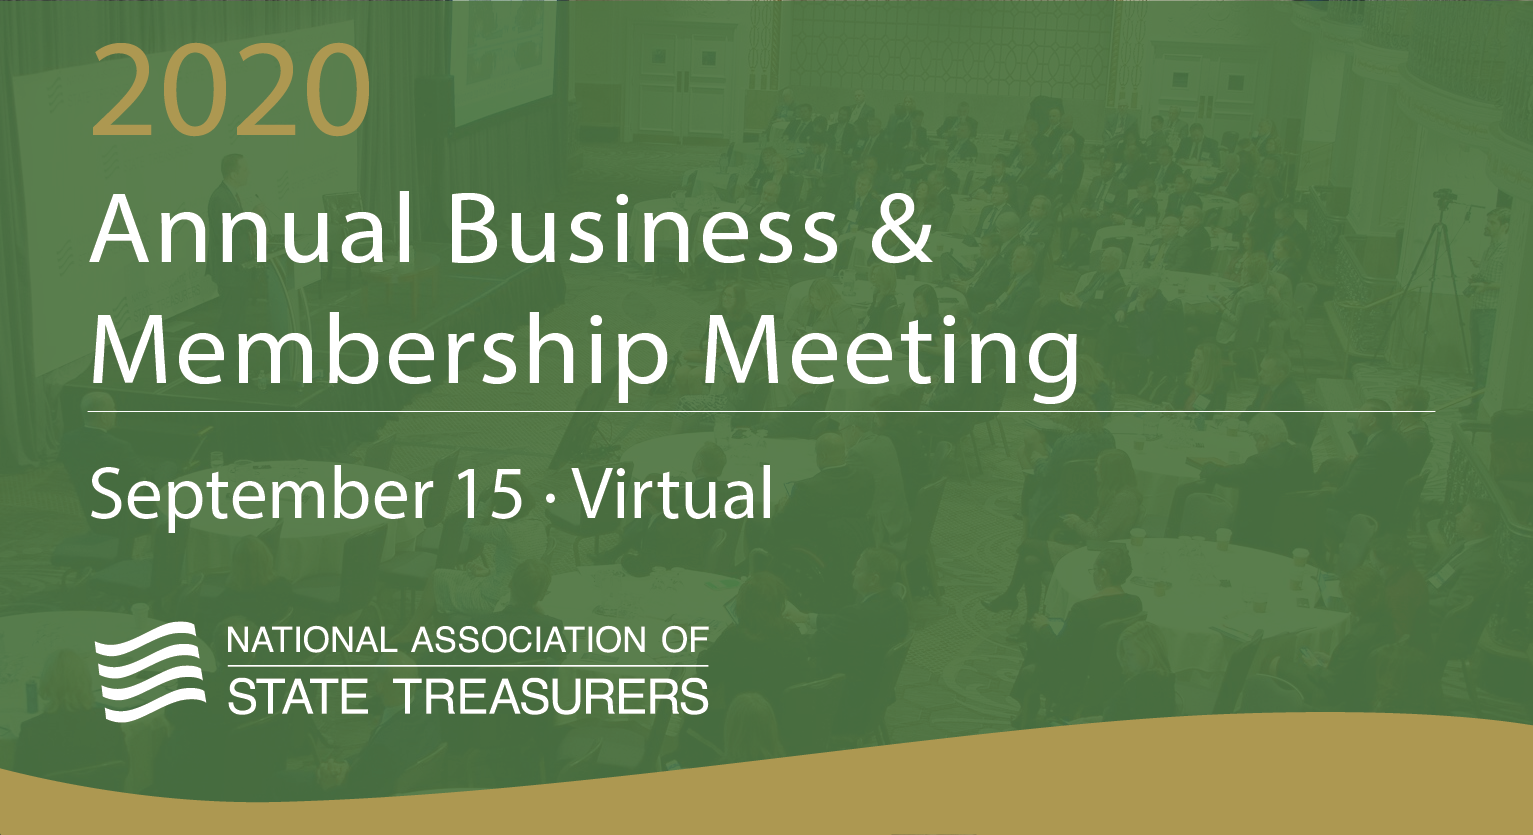 NAST's Annual Business & Membership Meeting